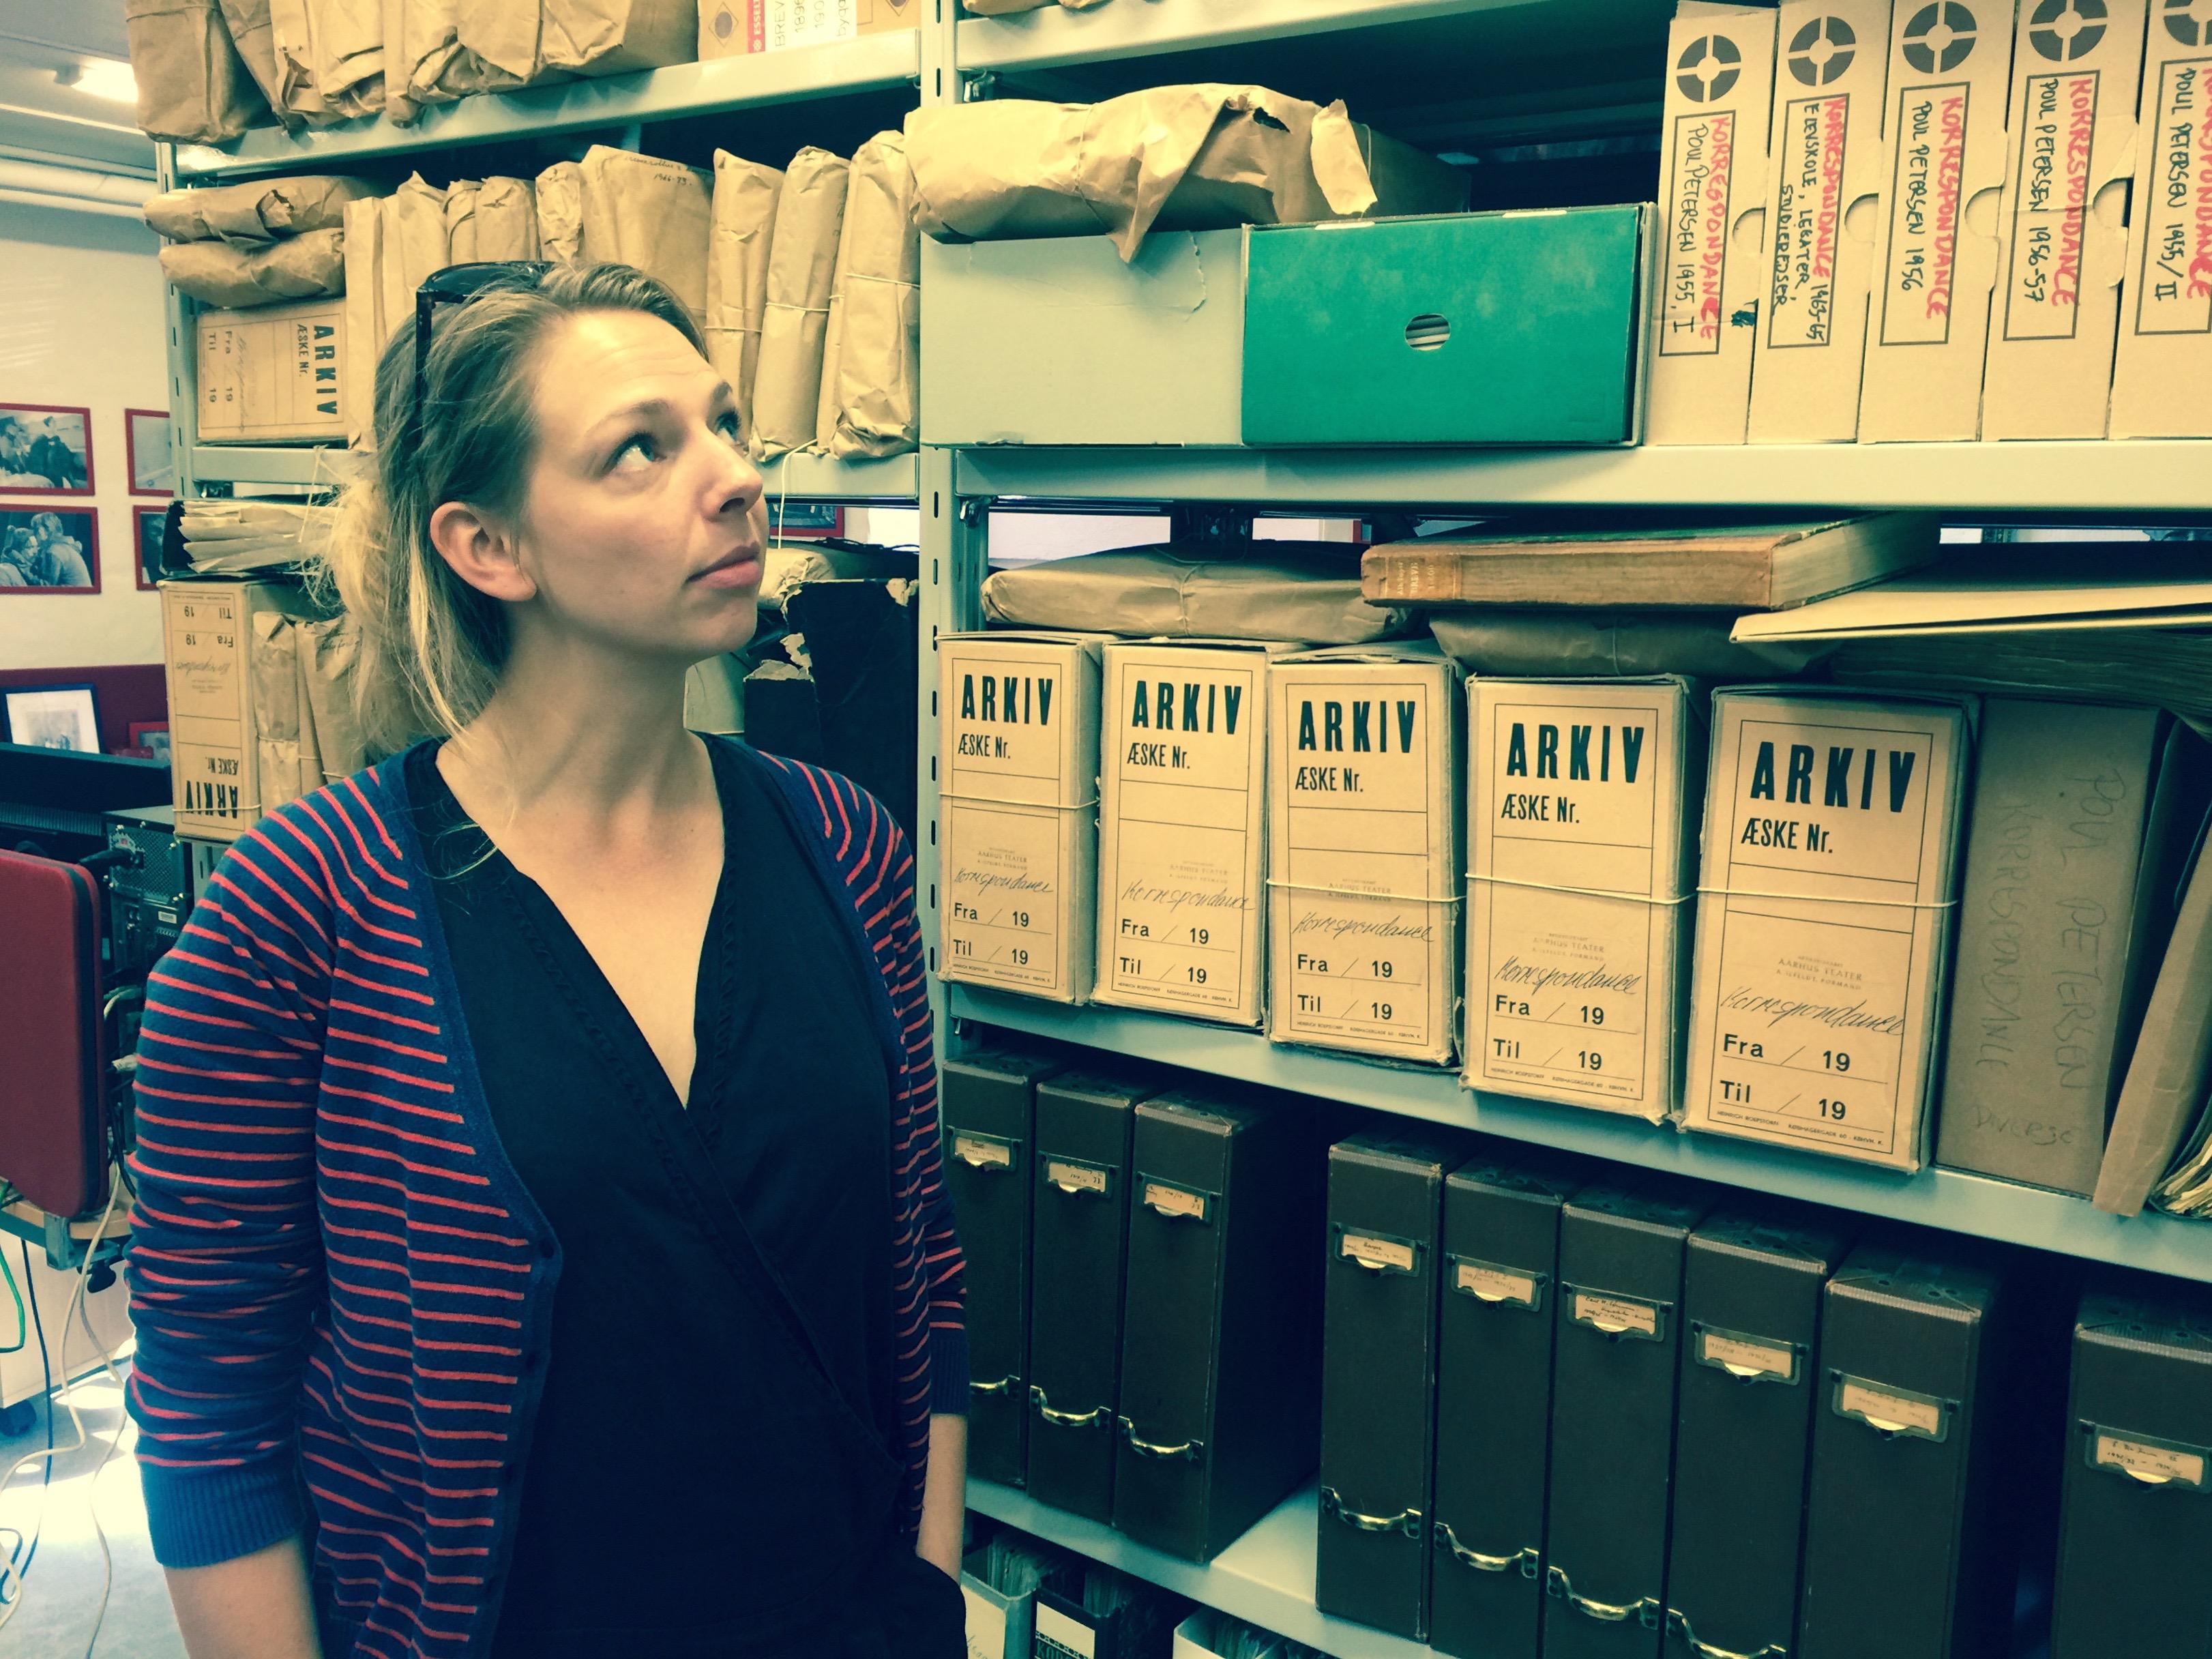 Julie Buch Hansen - Foto: Morten Hede